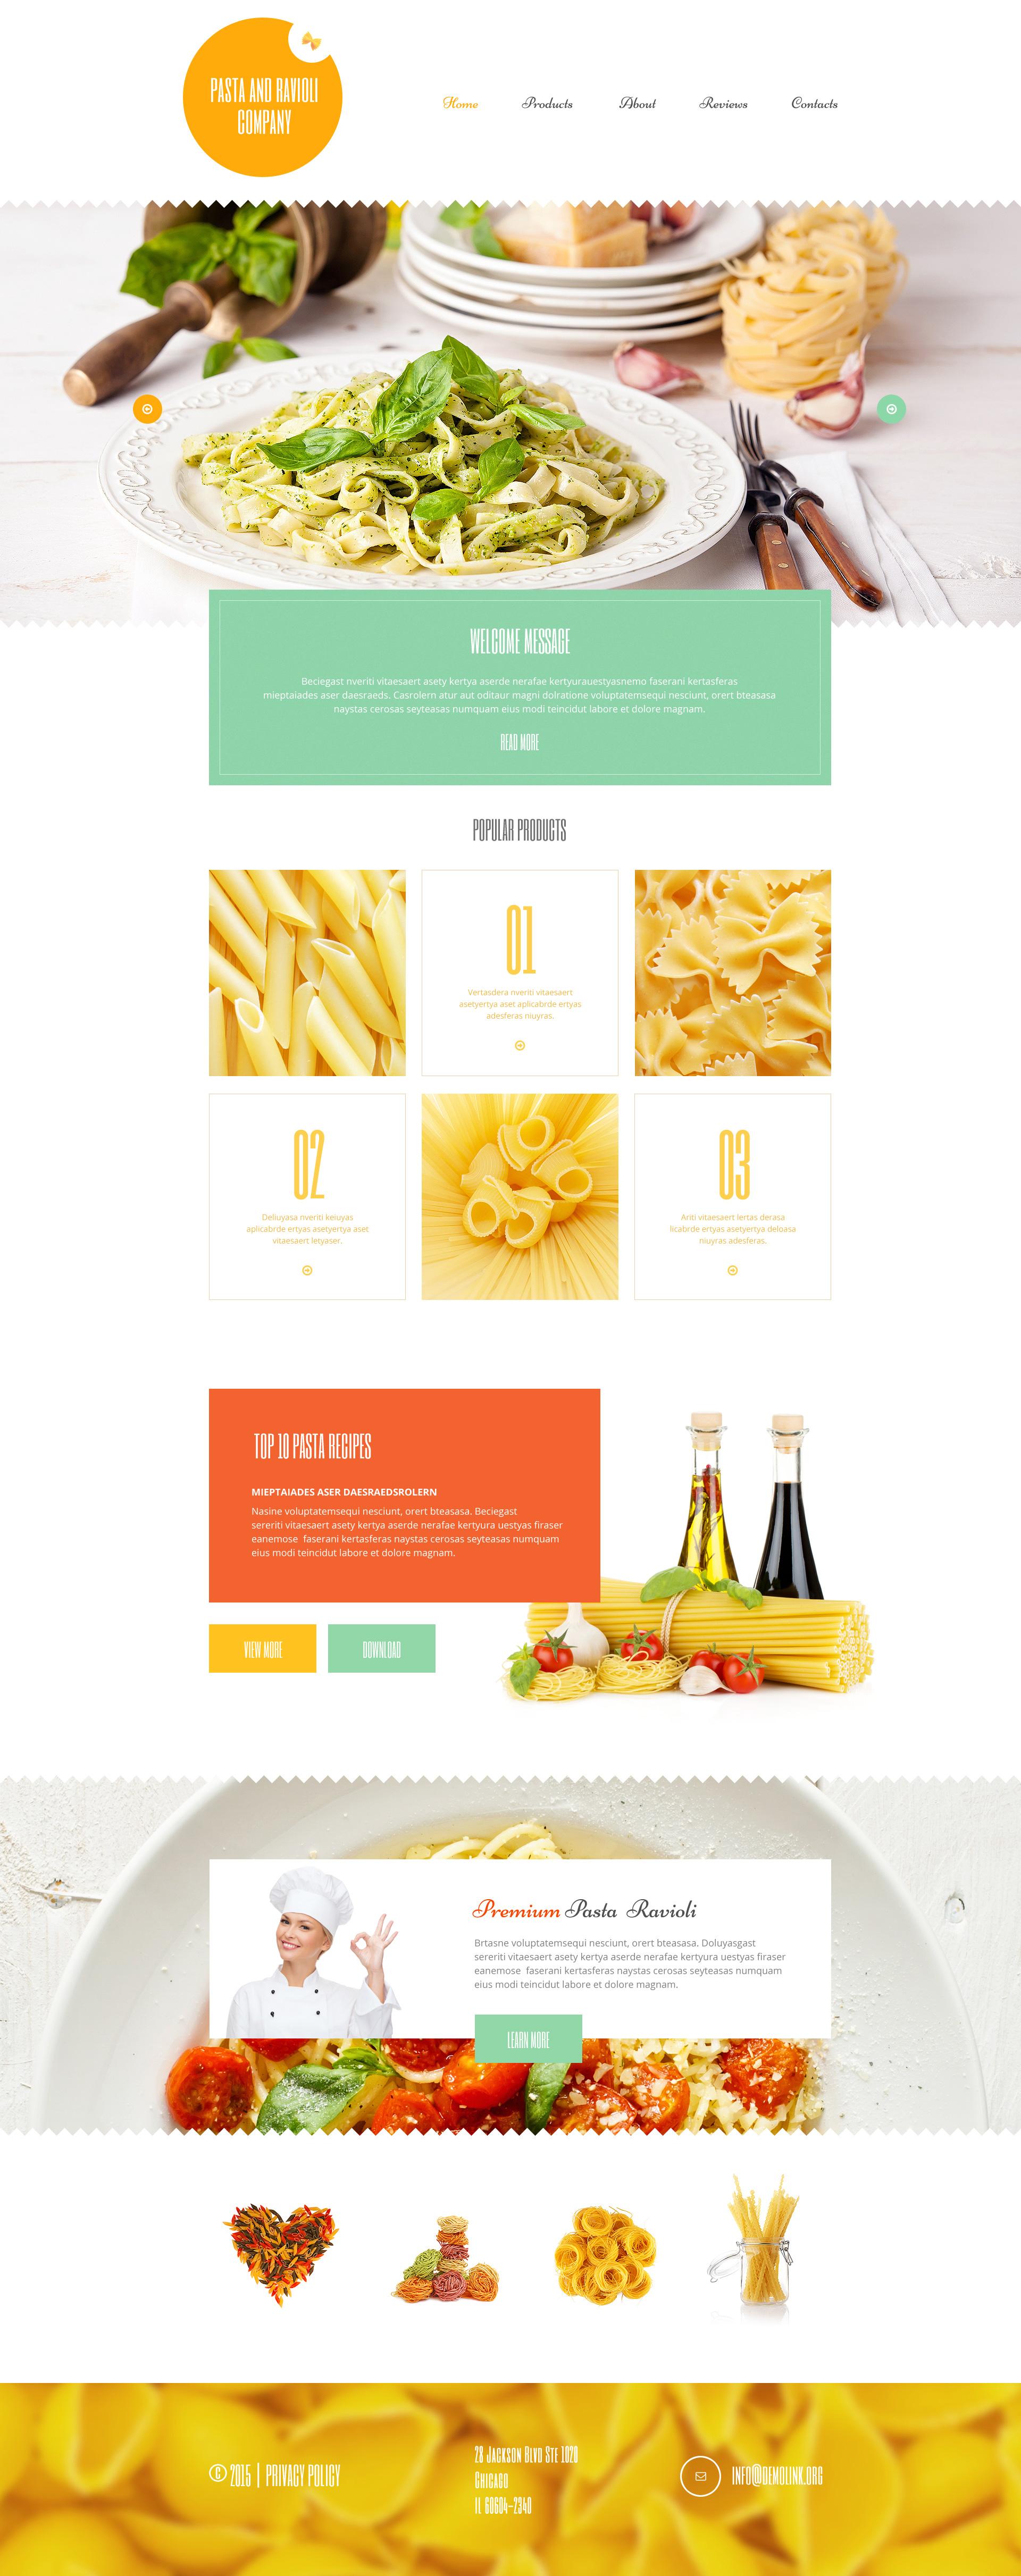 Pasta and Ravioli Company №55187